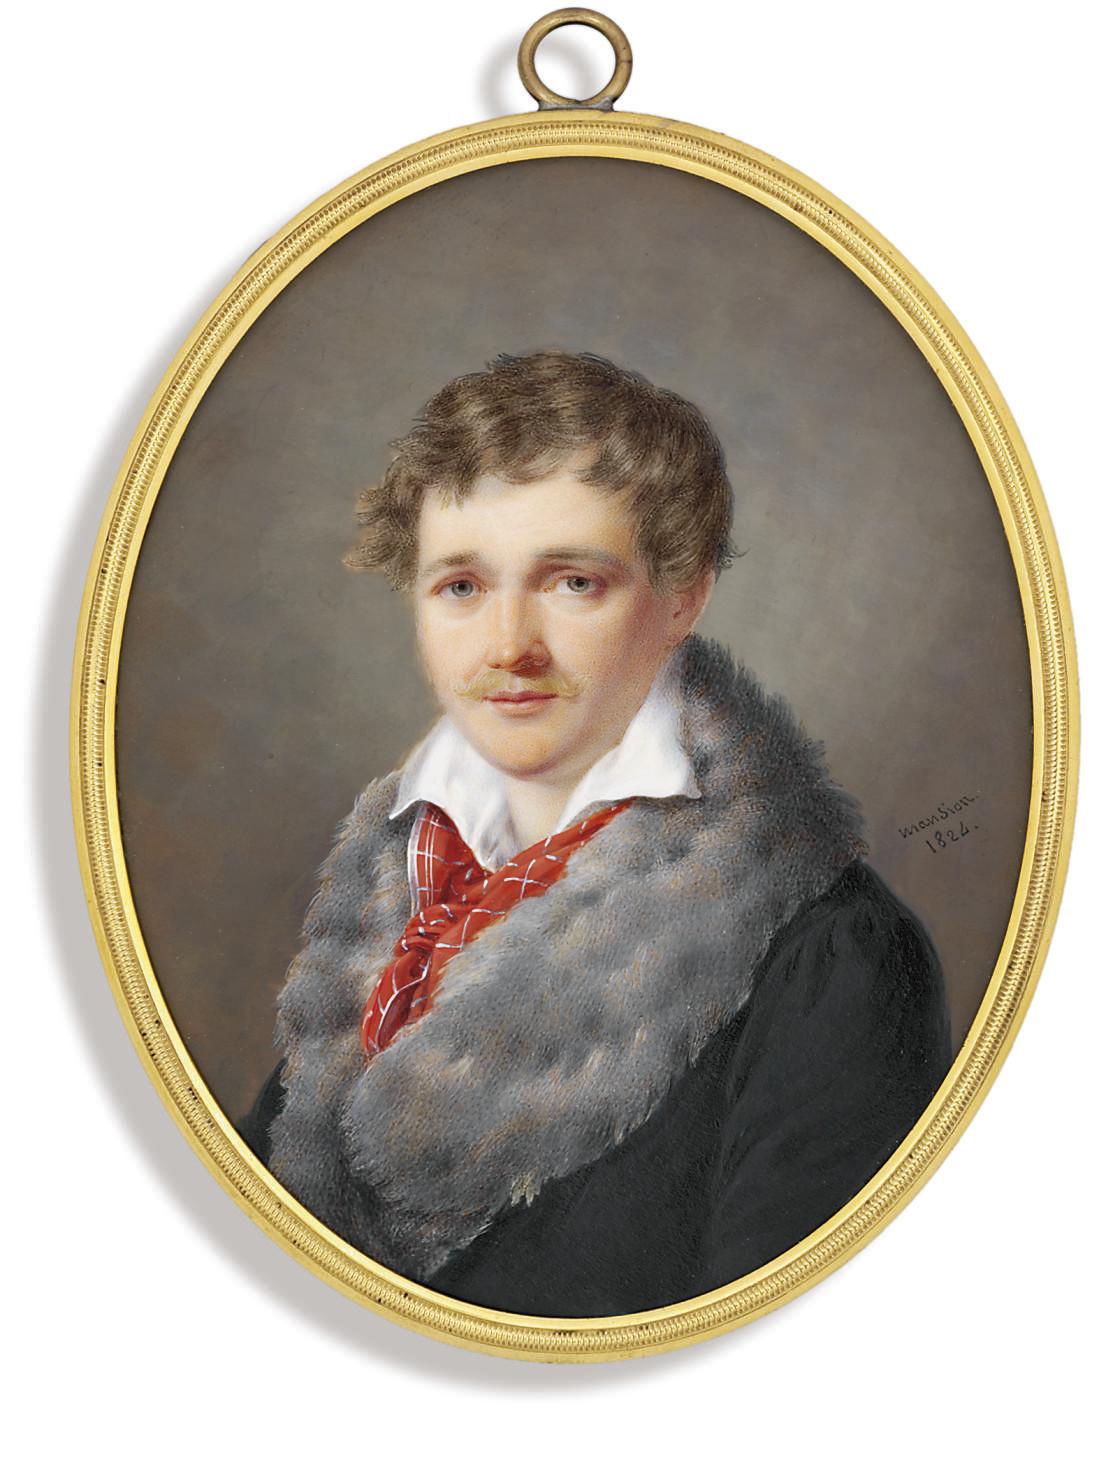 ANDRÉ LÉON LARUE, CALLED MANSI